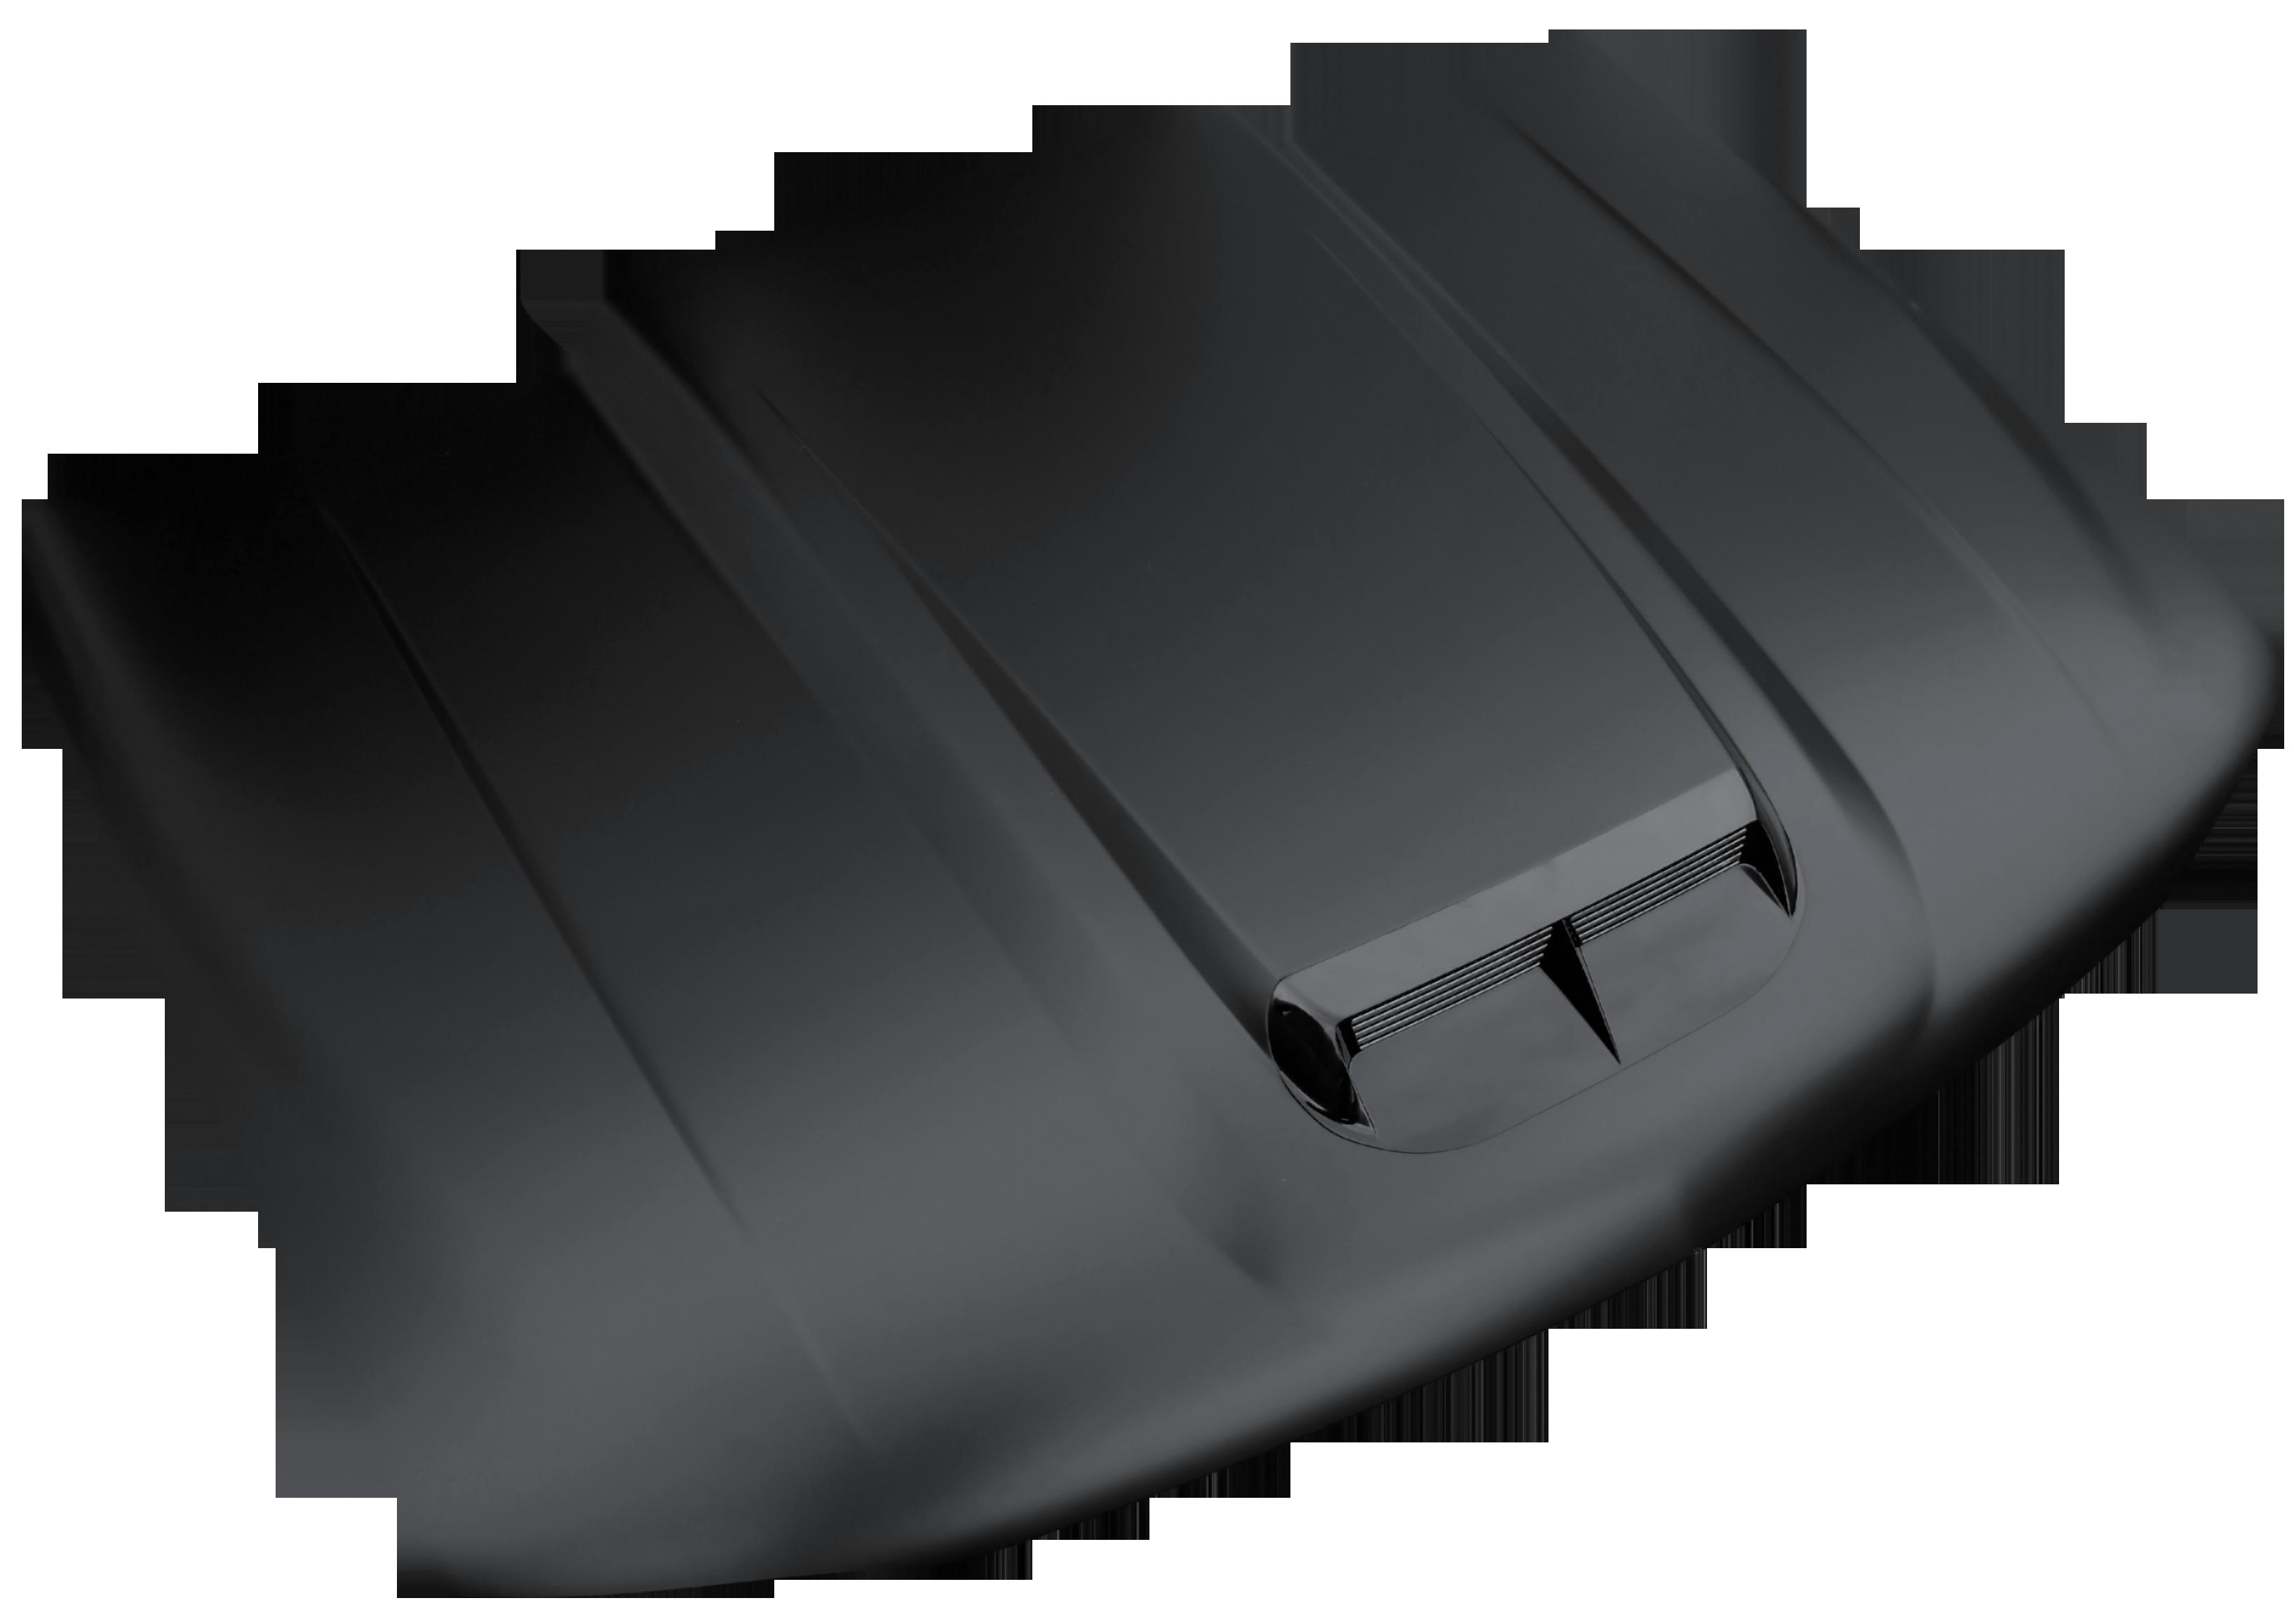 1999-2007 GMC/Sierra/Yukon ram air hood